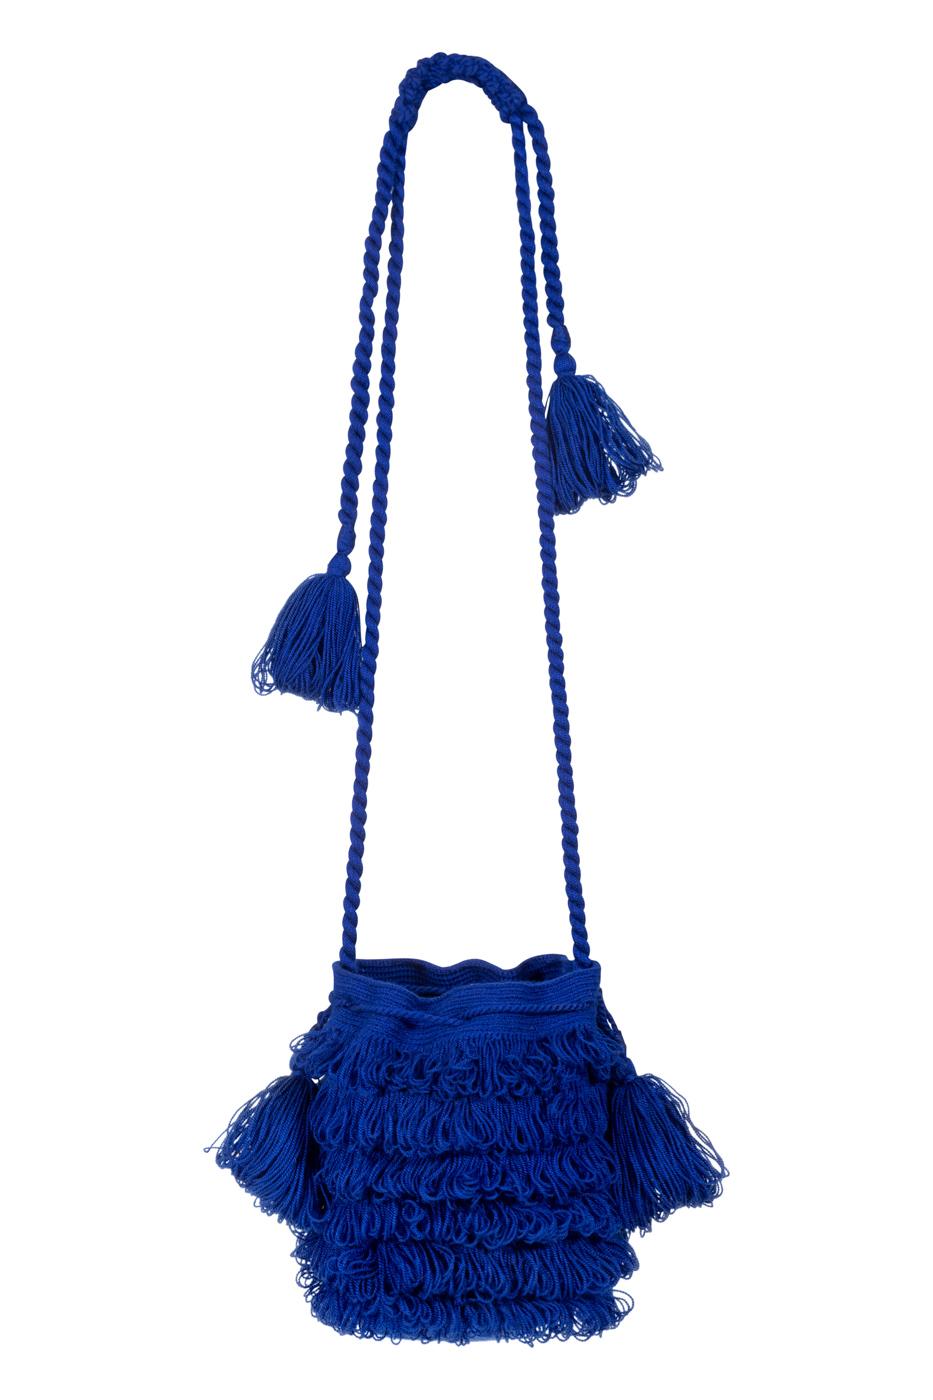 Mochila Bigotes azul rey